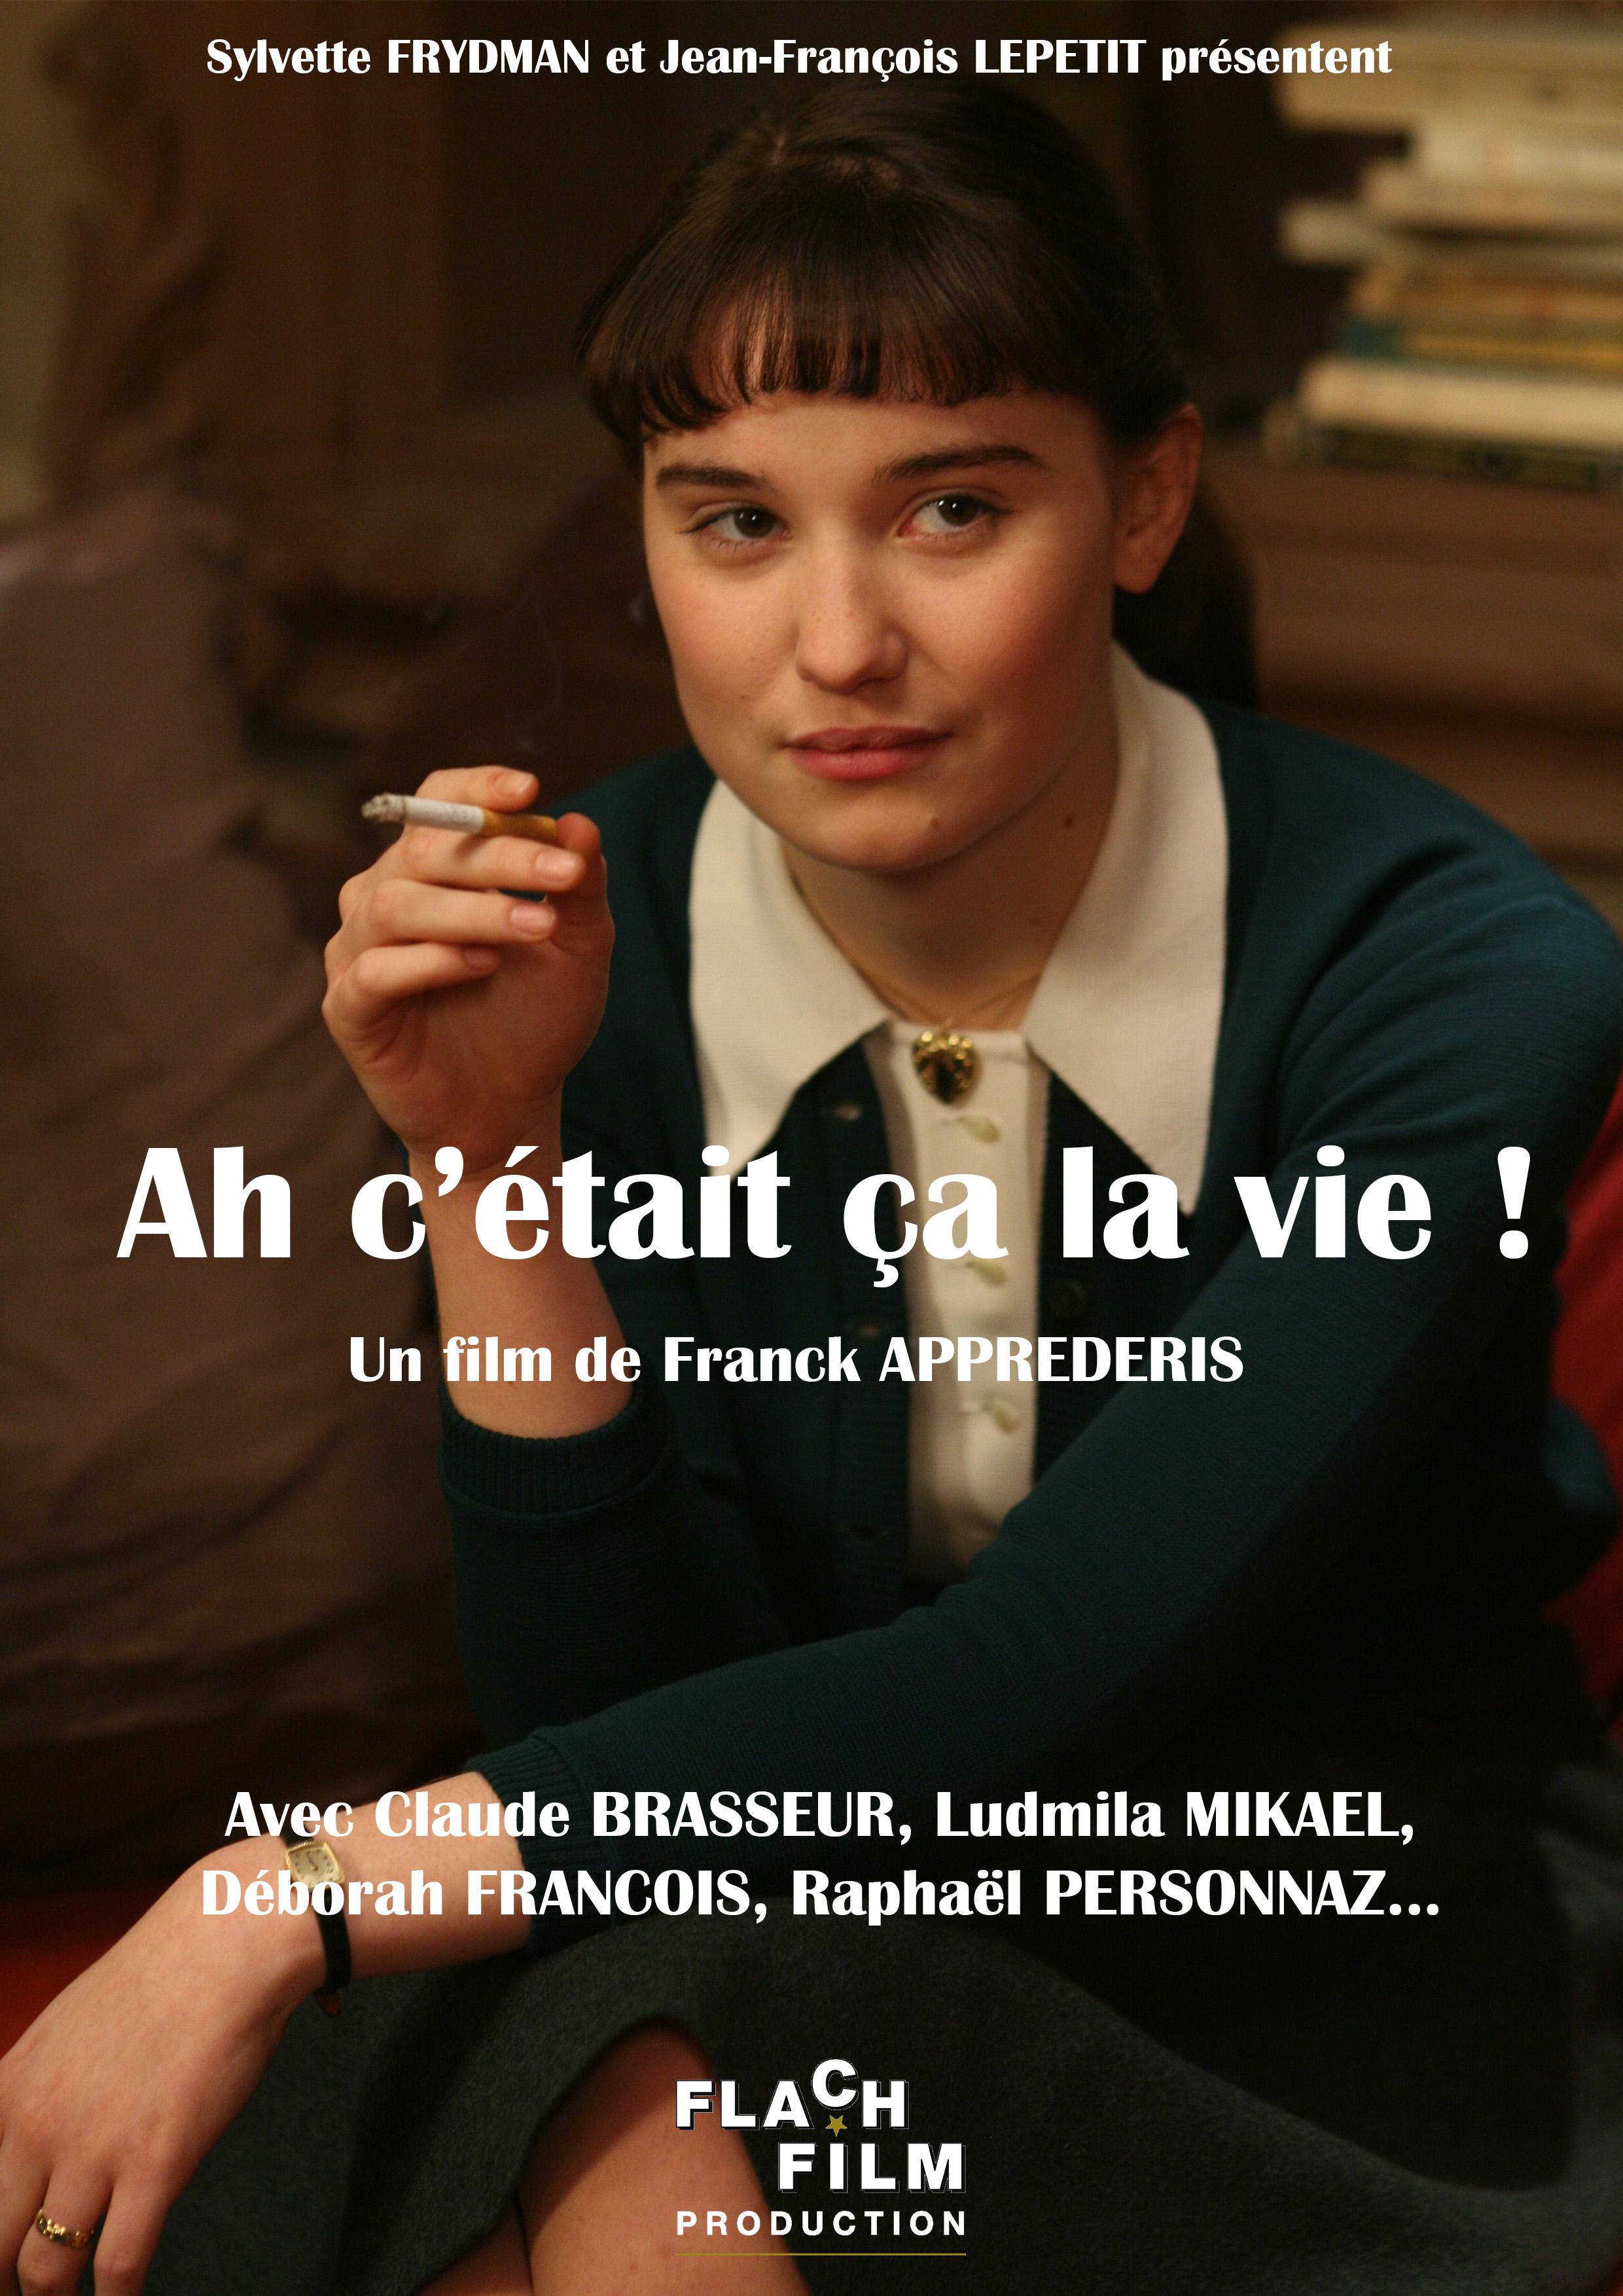 Ah, c'était ça la vie! (2009)